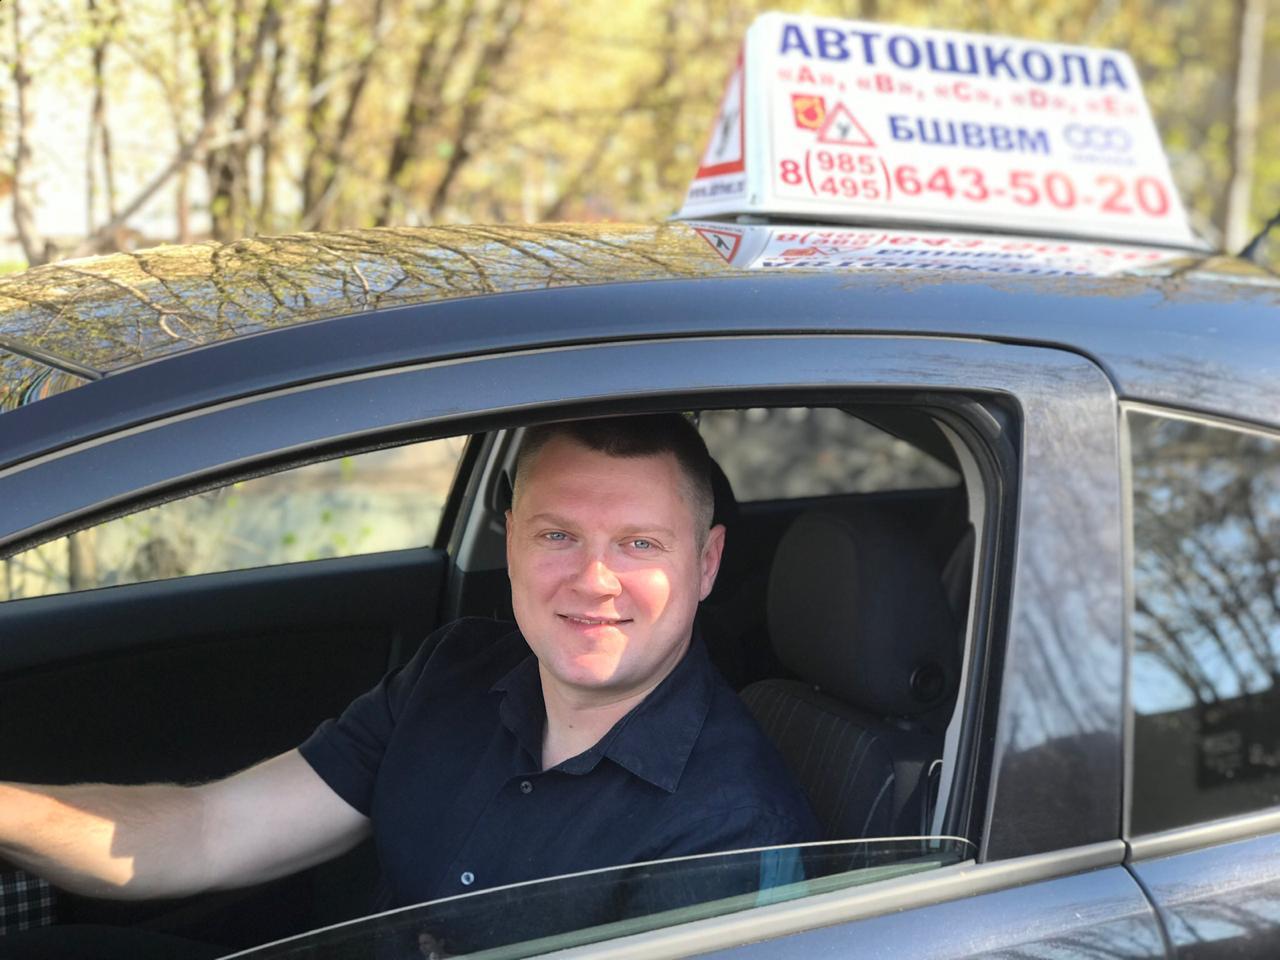 Арефьев Сергей Михайлович